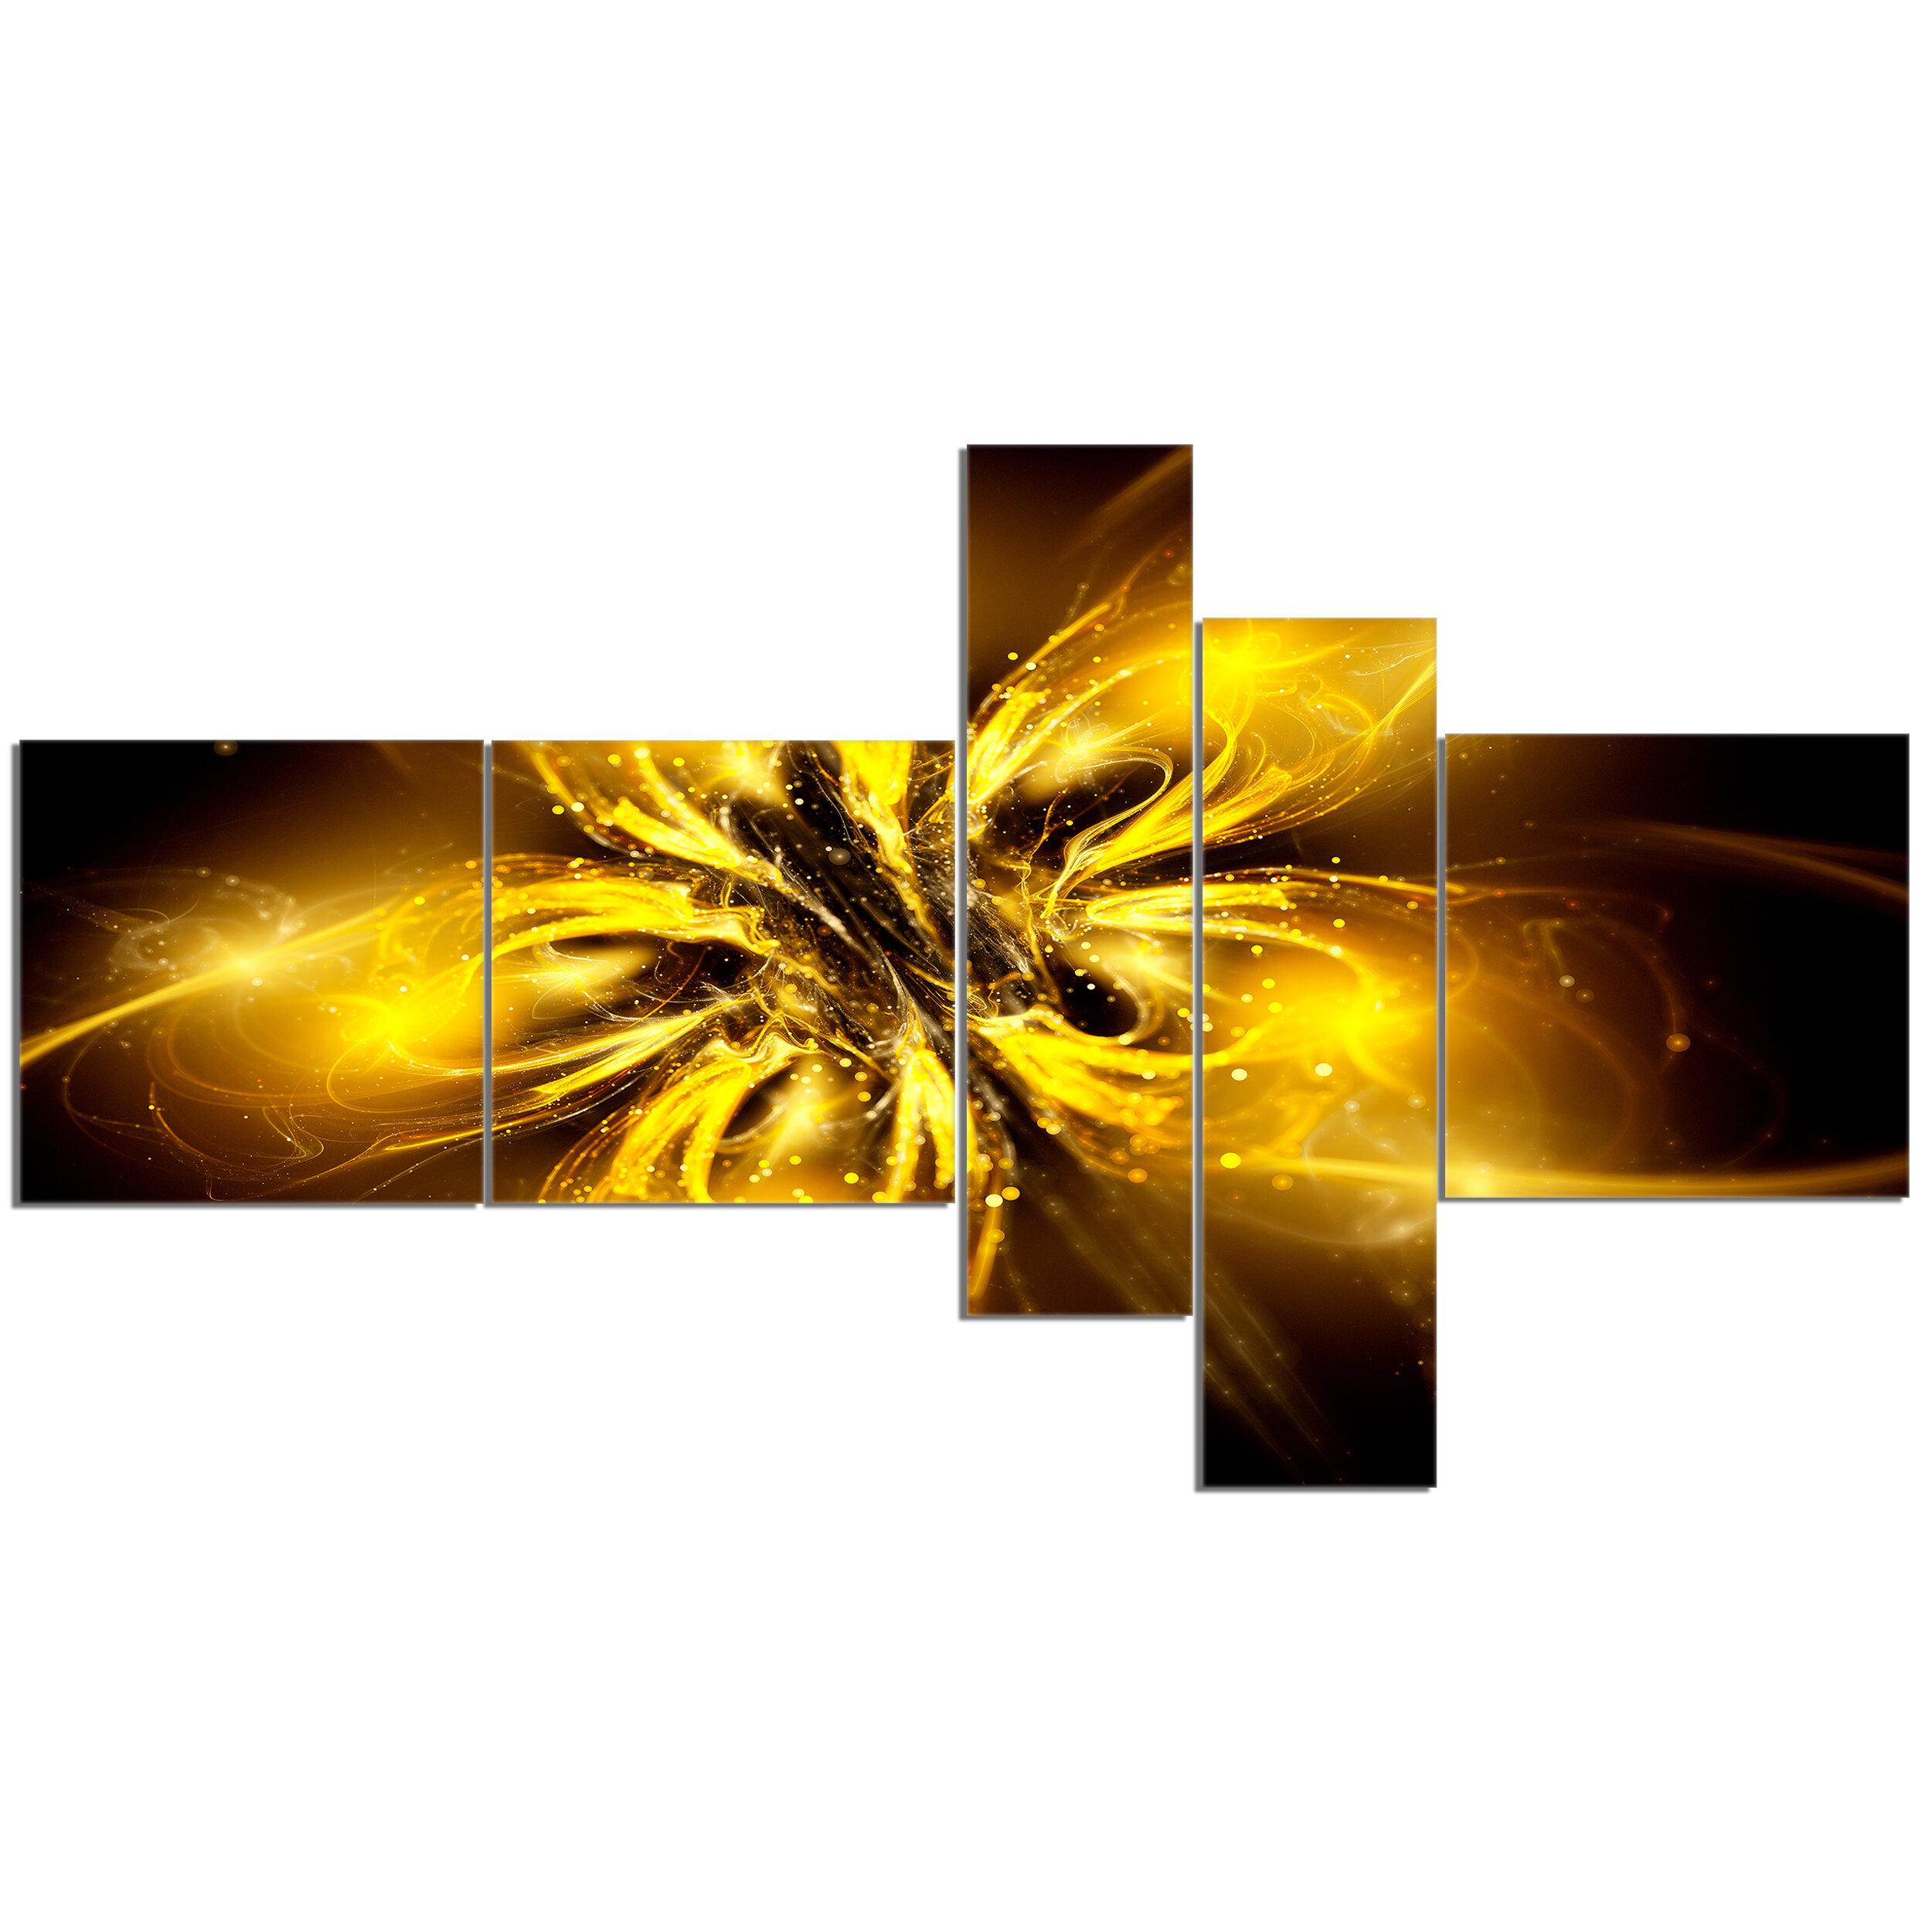 East Urban Home Shiny Gold Fractal Flower On Black Graphic Art Print Multi Piece Image On Canvas Wayfair